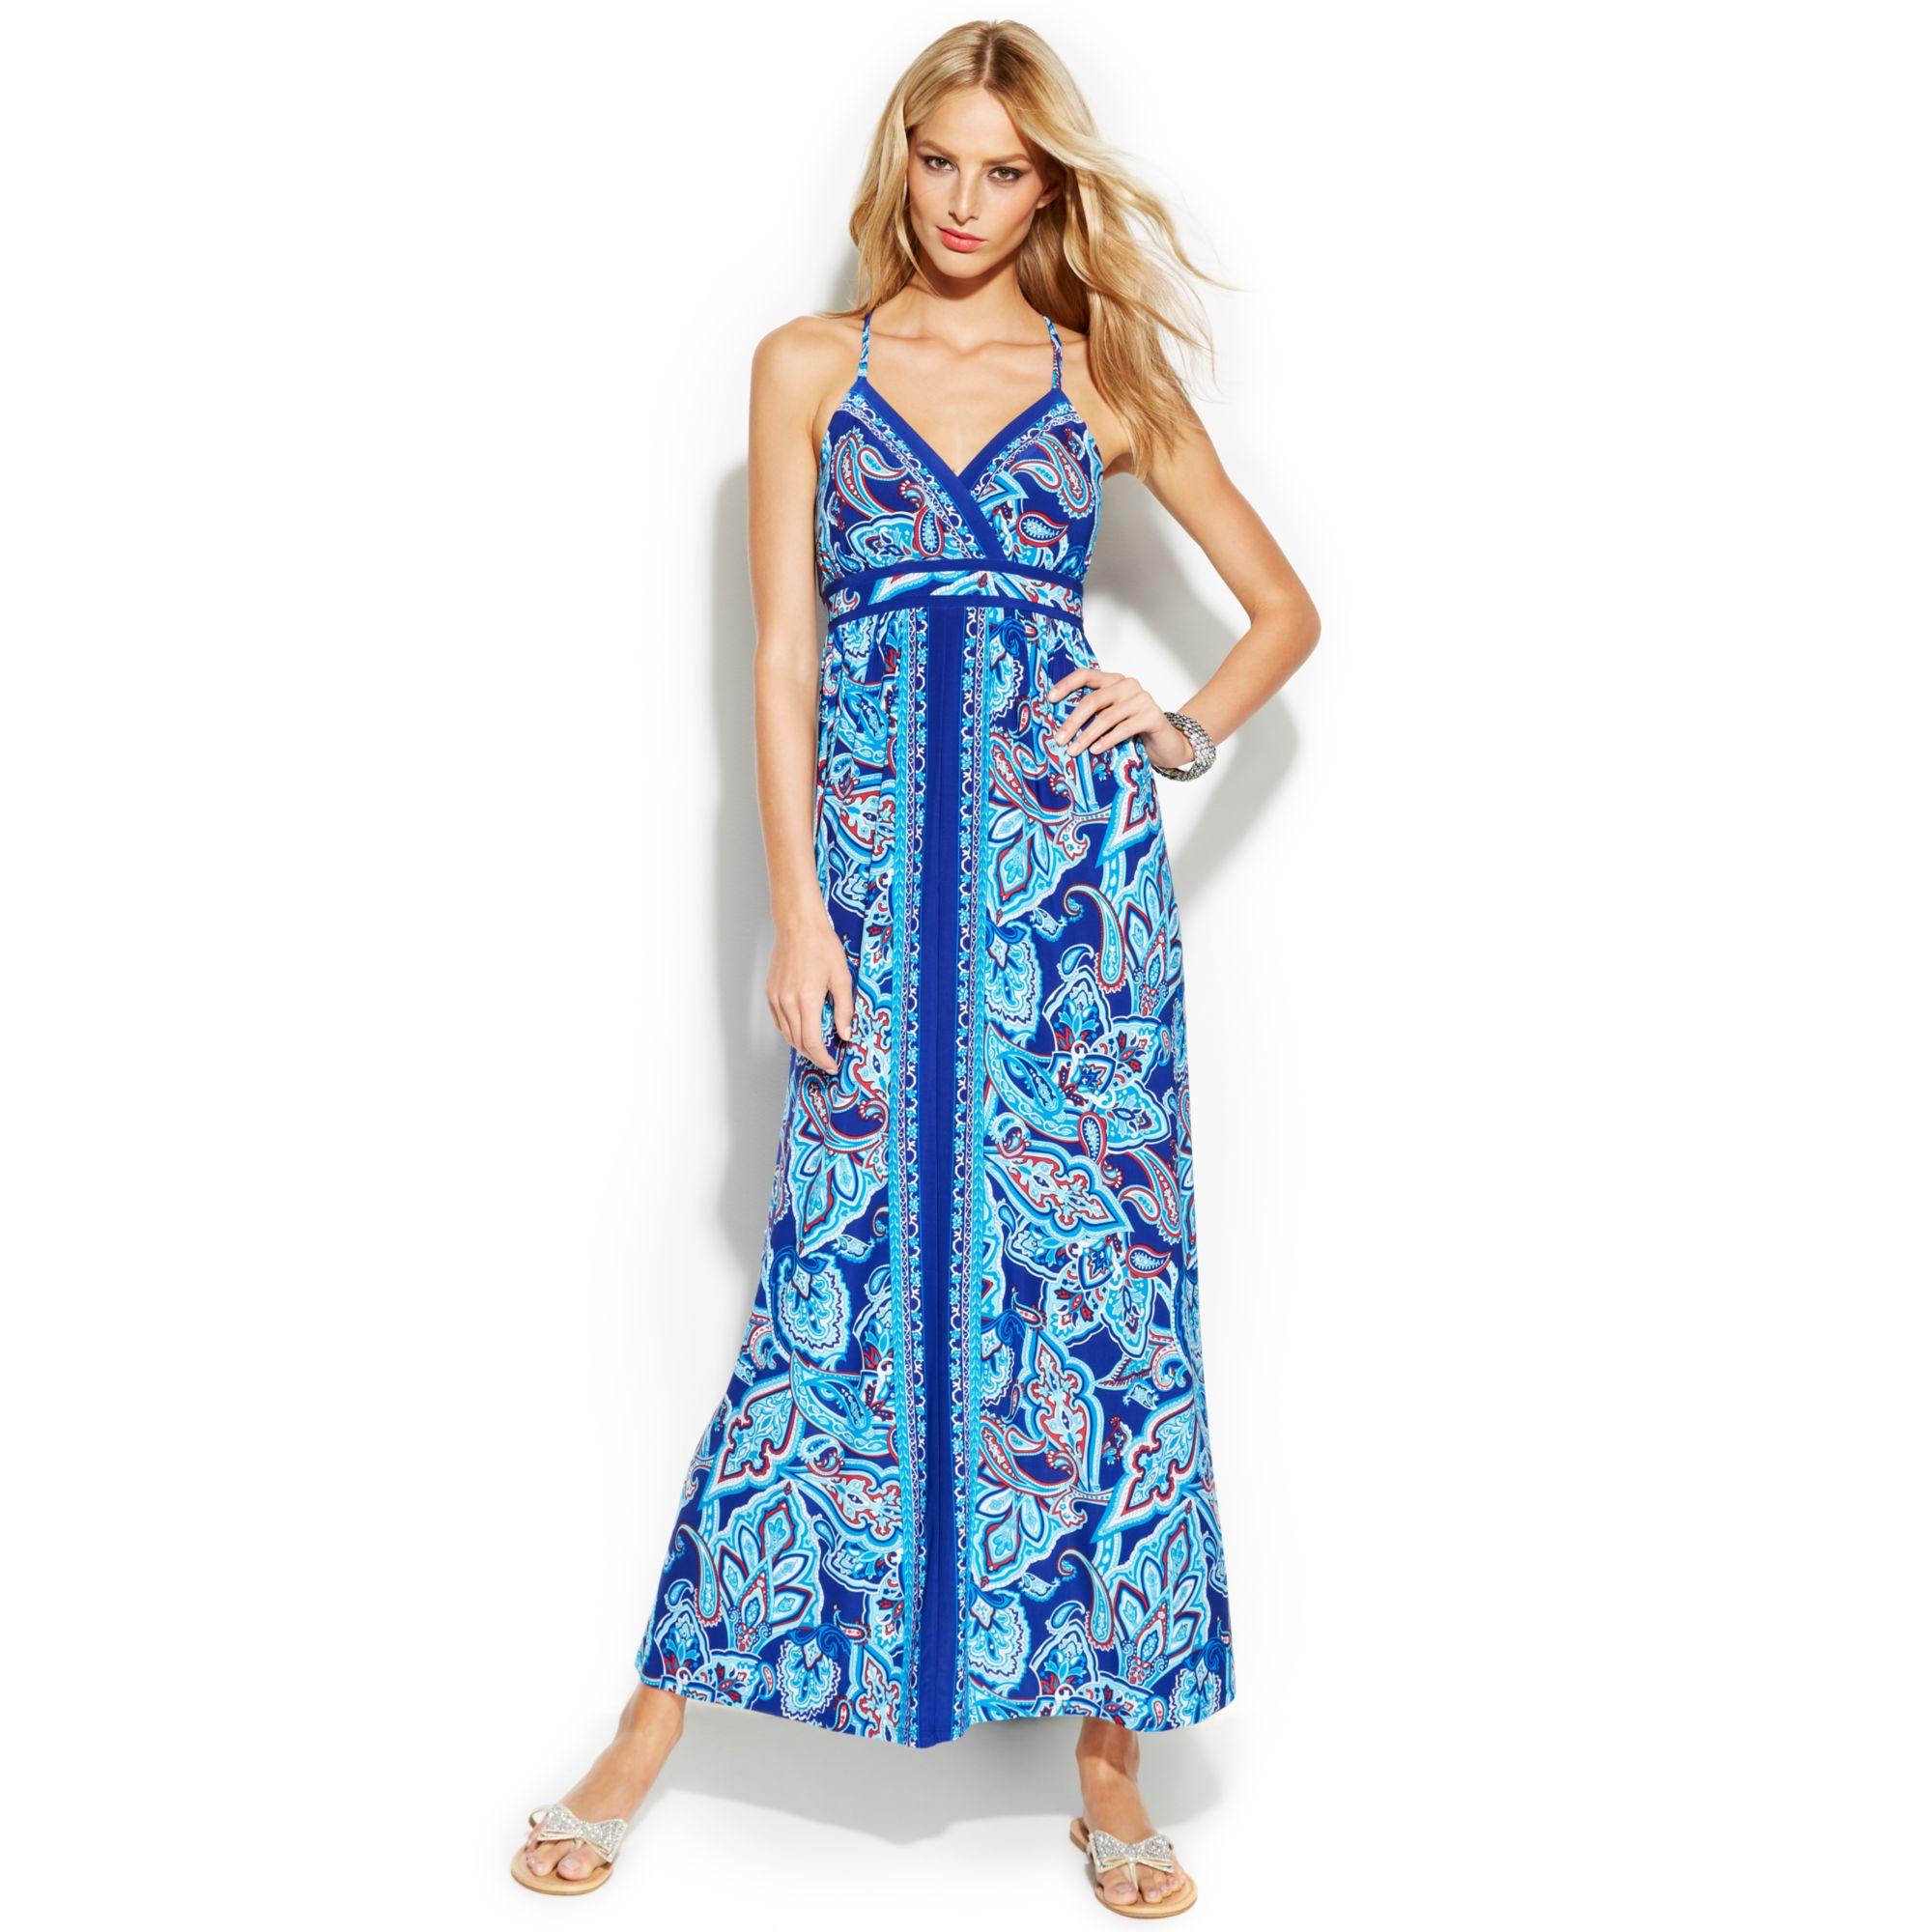 Inc Clothing At Macy S